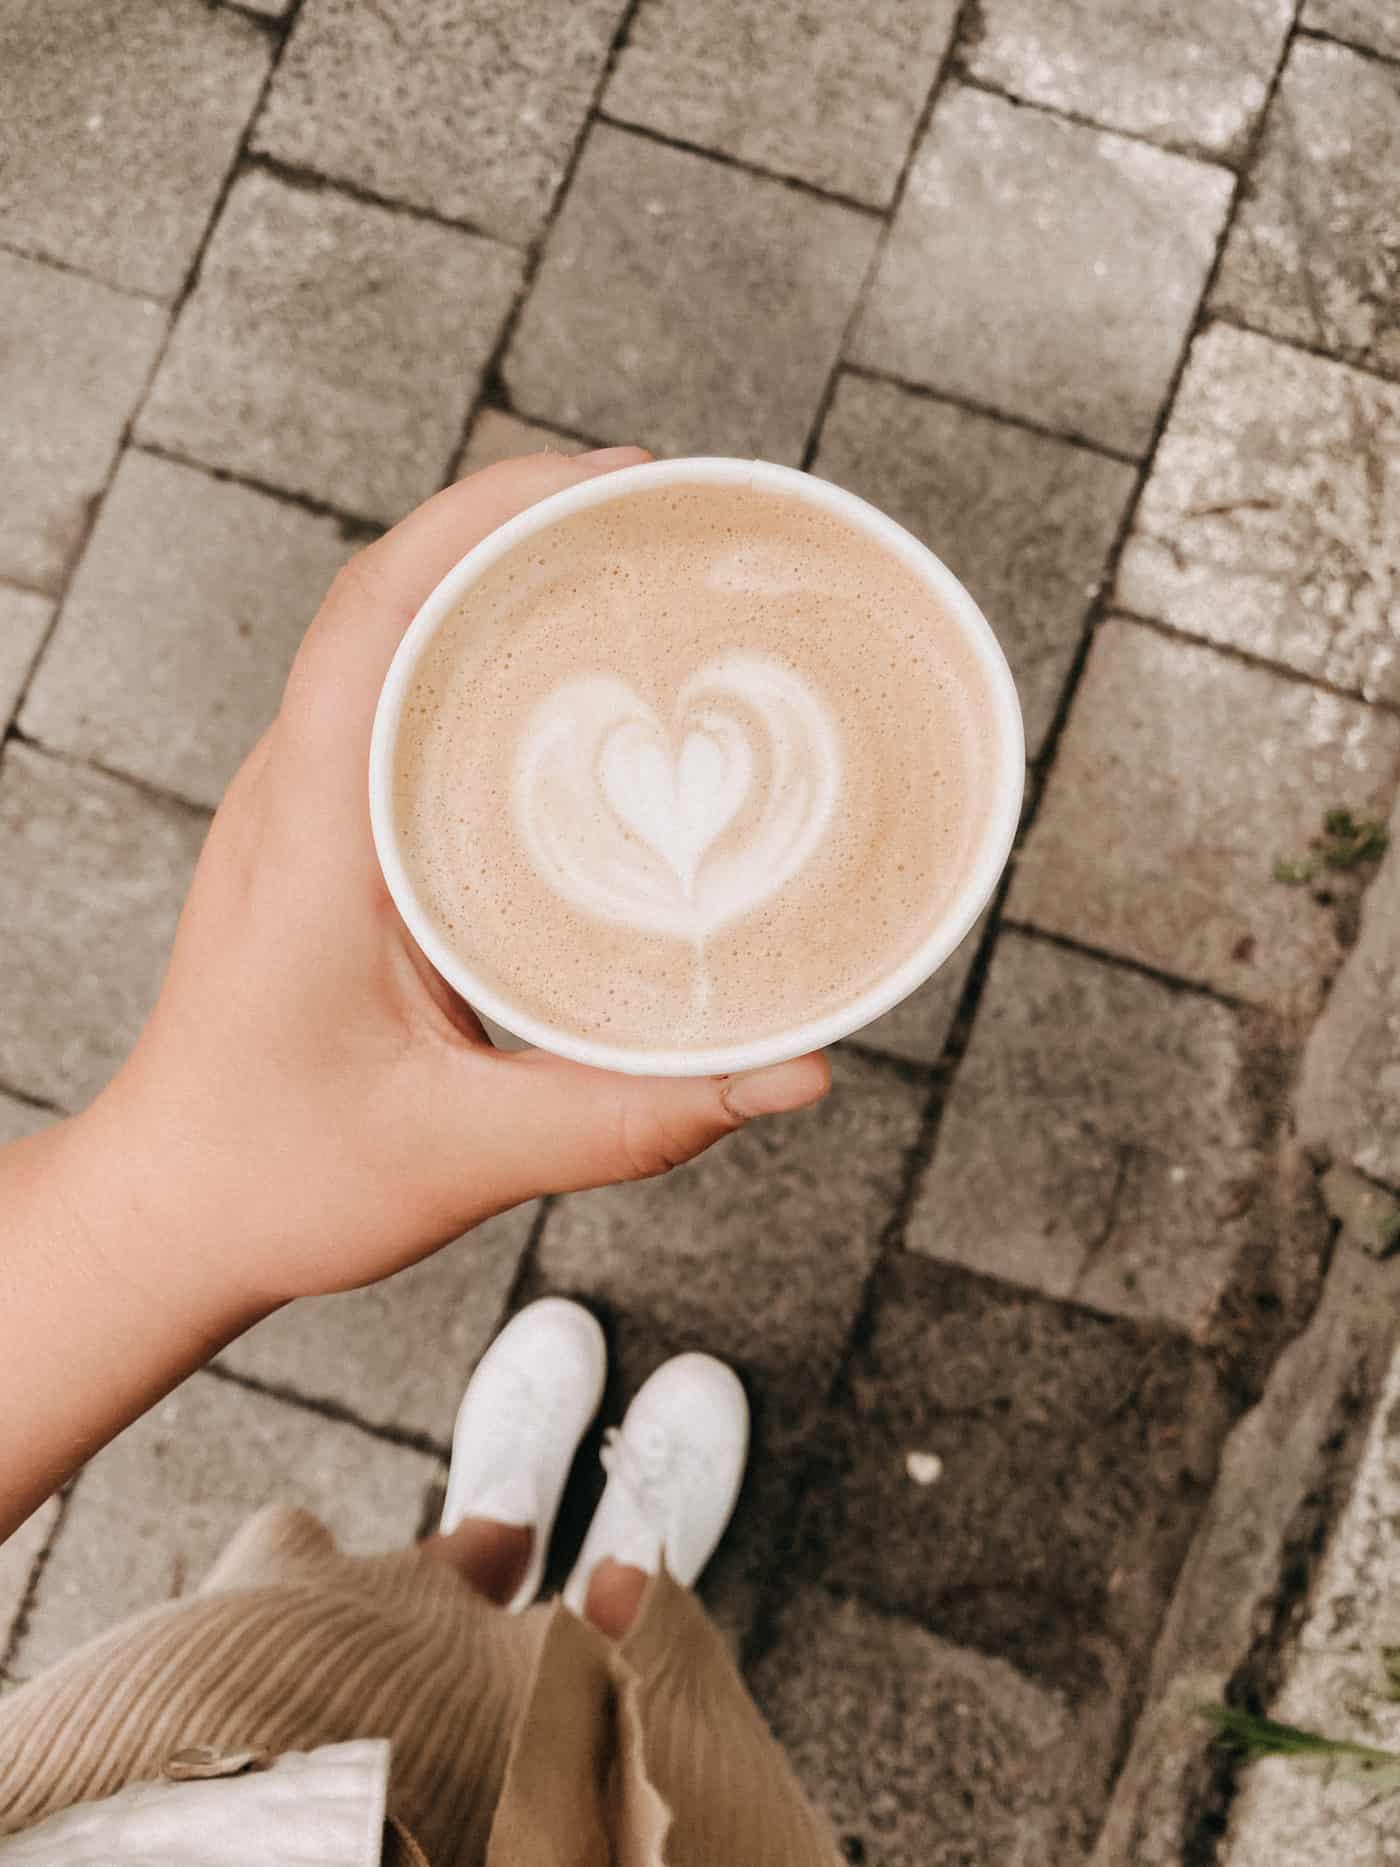 Kaffee Bornhorst Aan Tafel